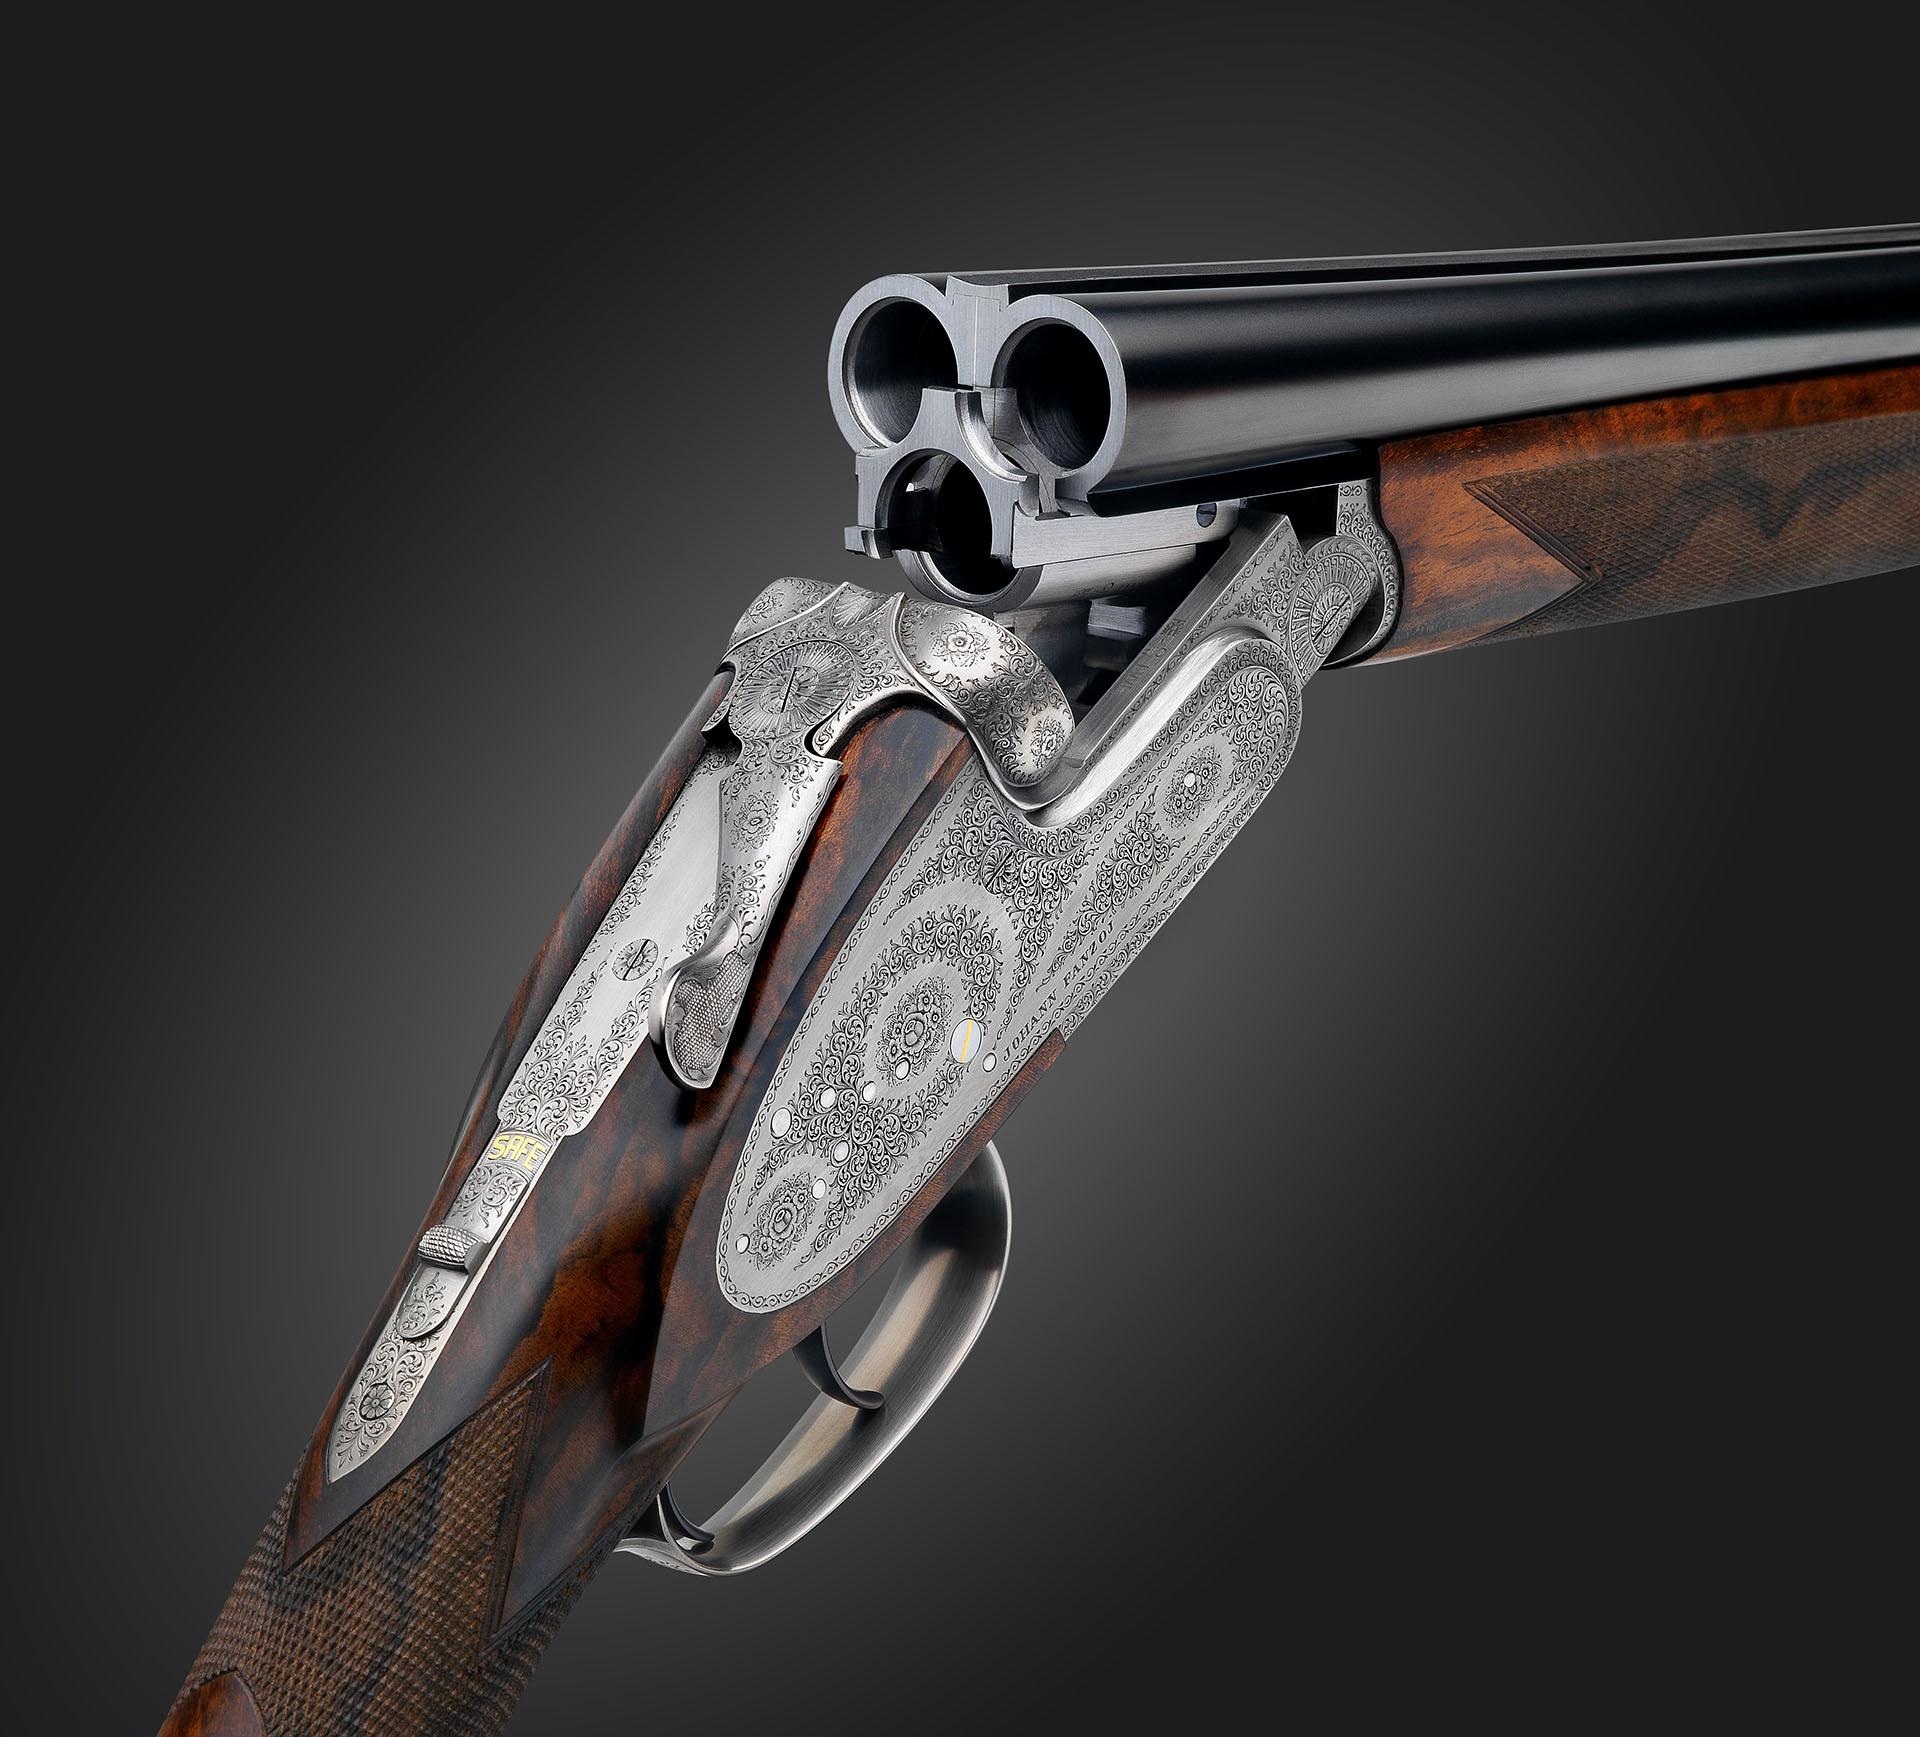 The triple shotgun johann fanzoj a triple barrel gun that shoots with the ease of a double thecheapjerseys Choice Image